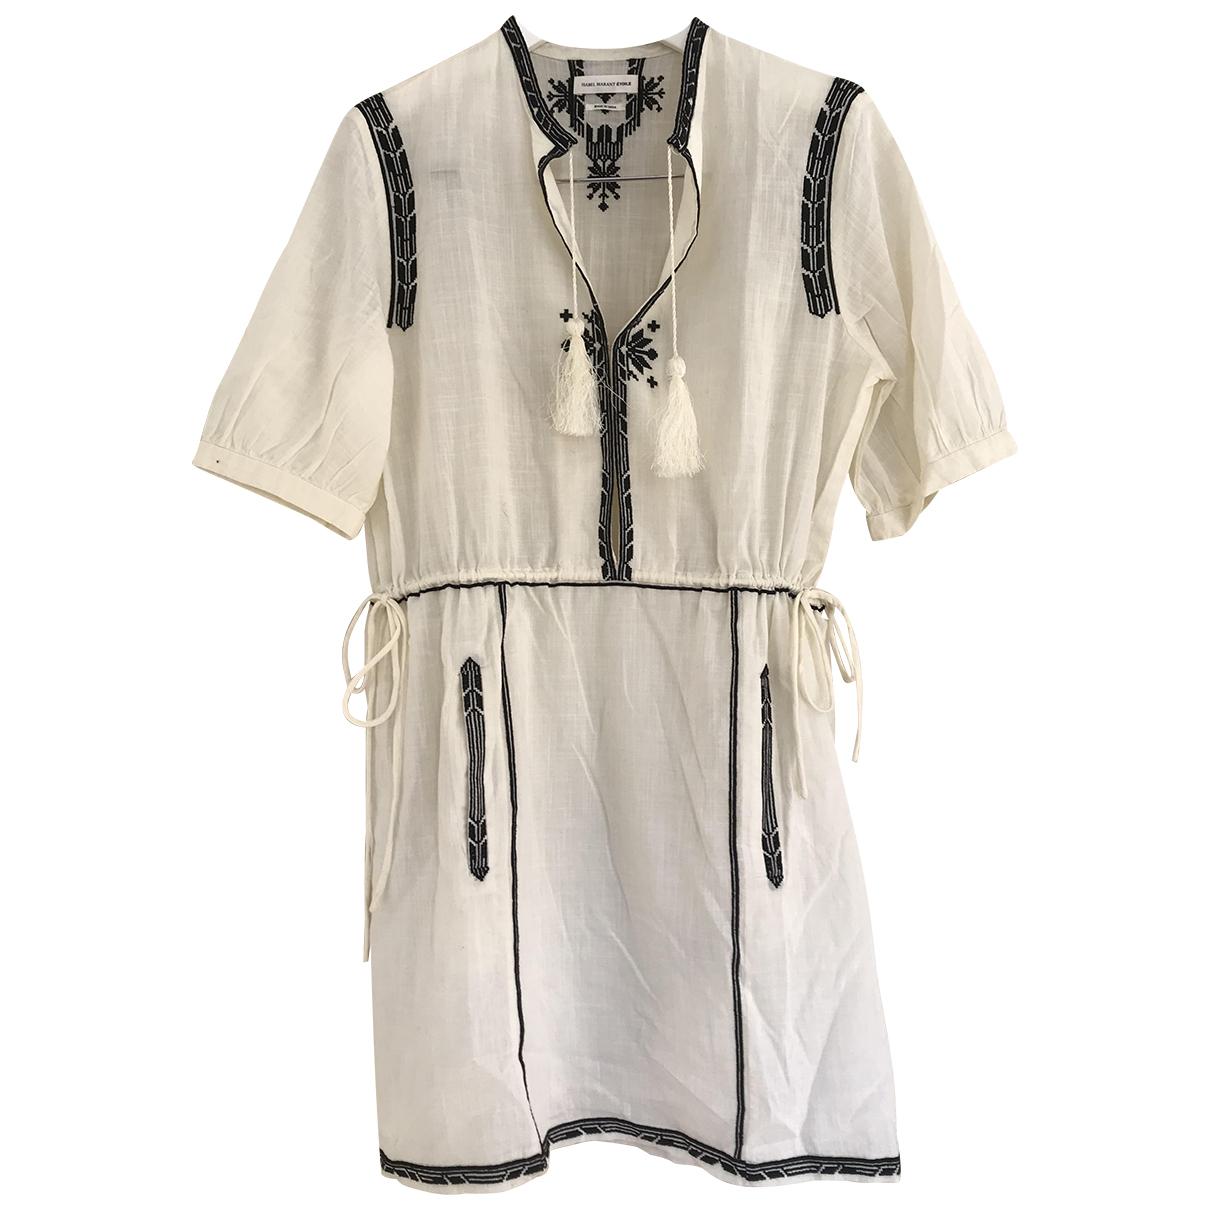 Isabel Marant Etoile \N Ecru Cotton dress for Women 36 FR